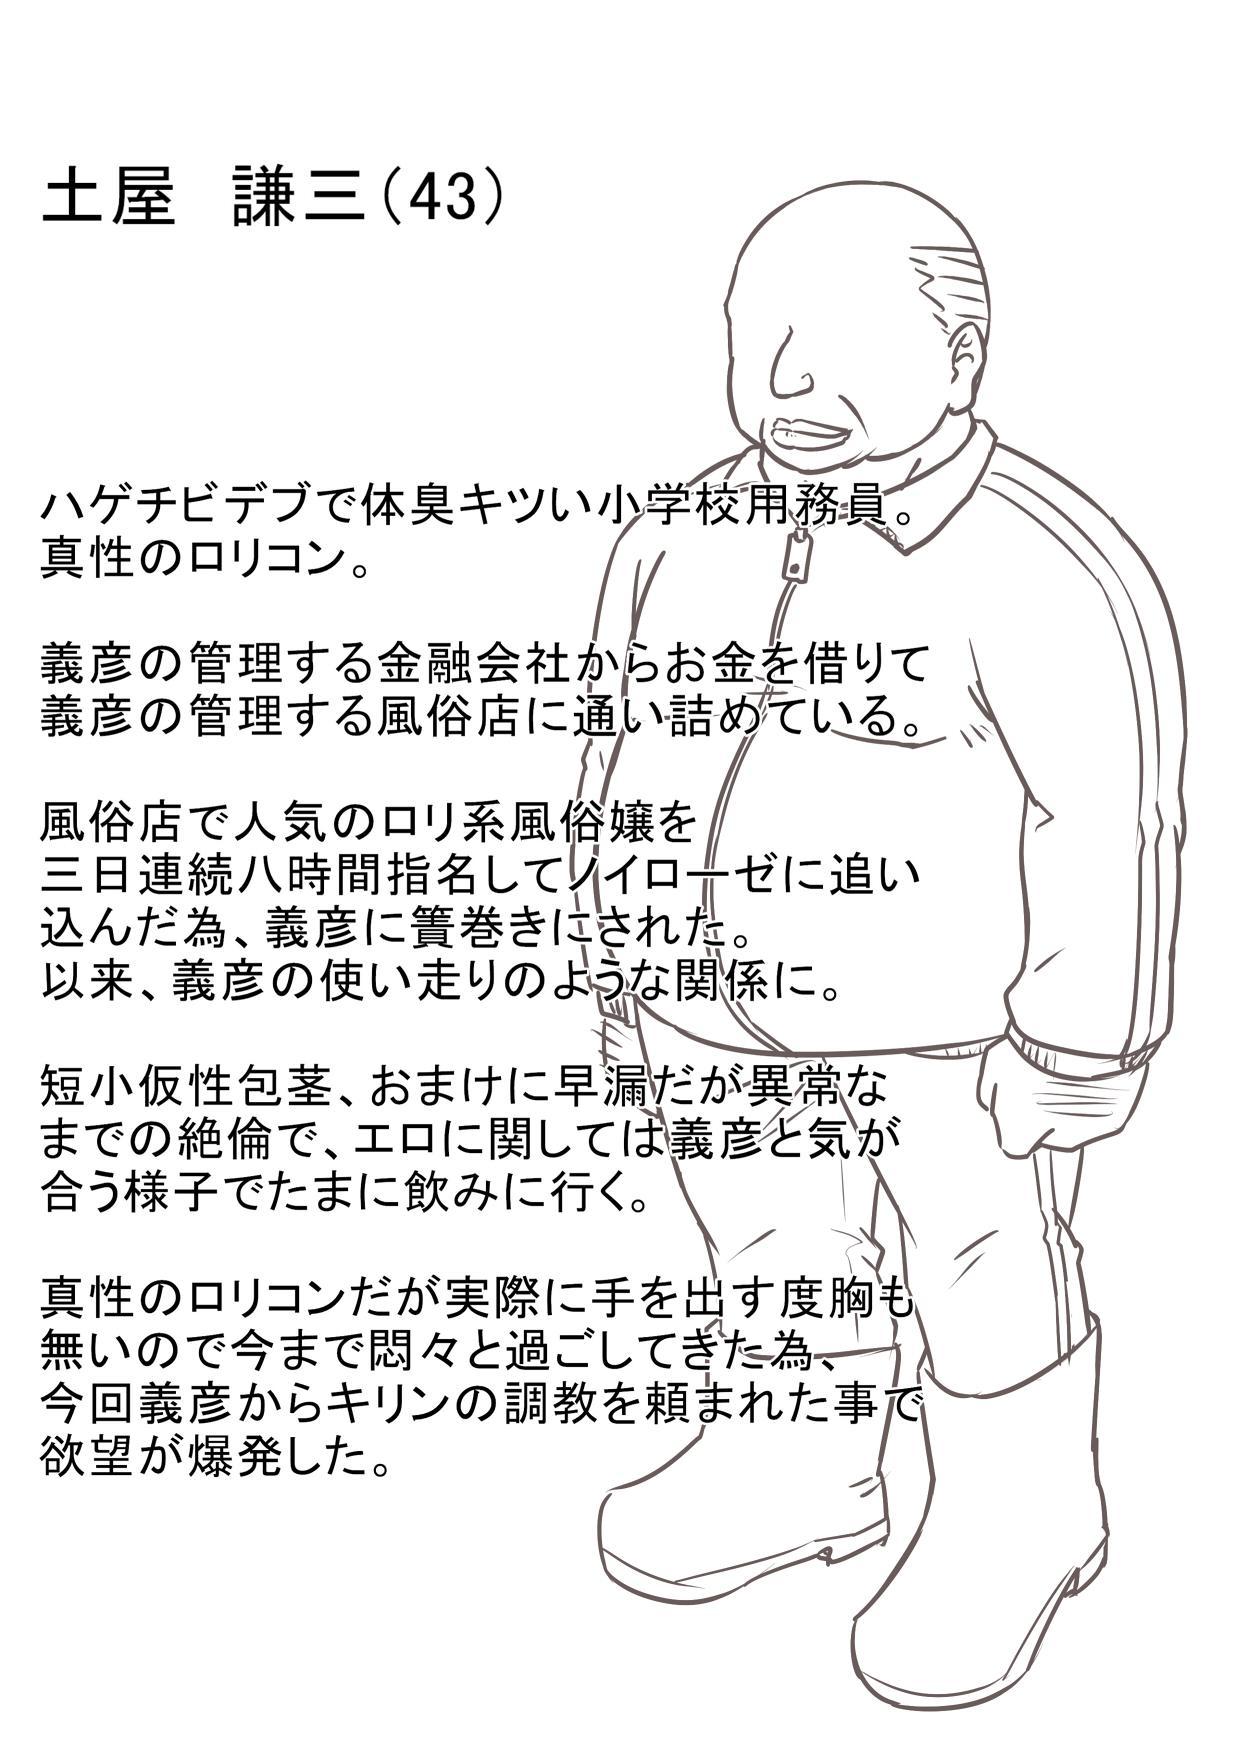 Hitozuma Kirika 143